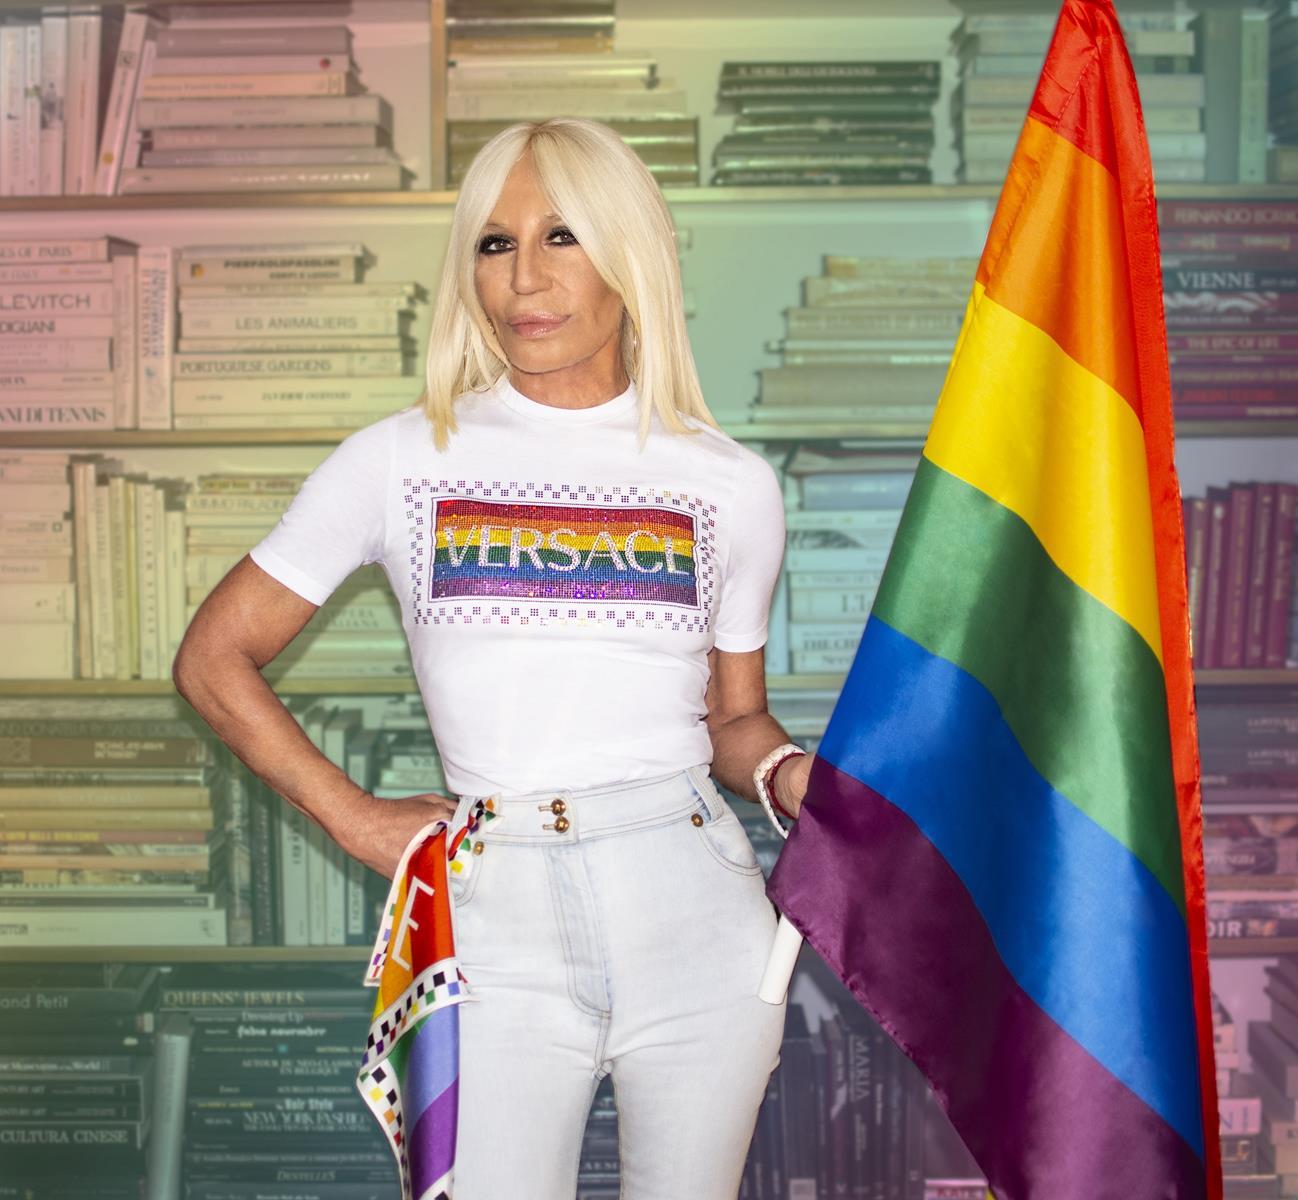 versace t-shirt pride rainbow